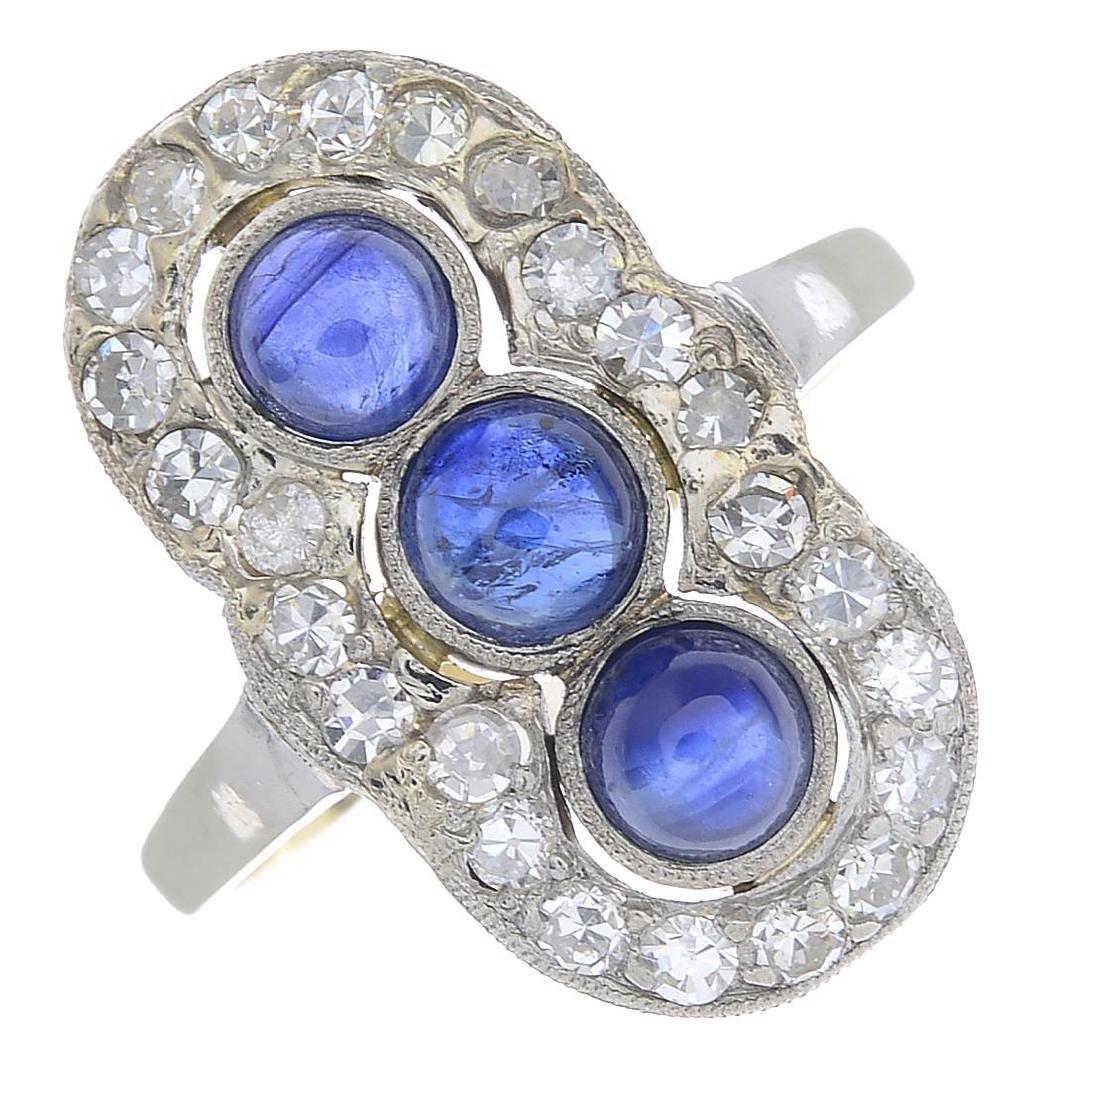 A sapphire and diamond dress ring. The circular